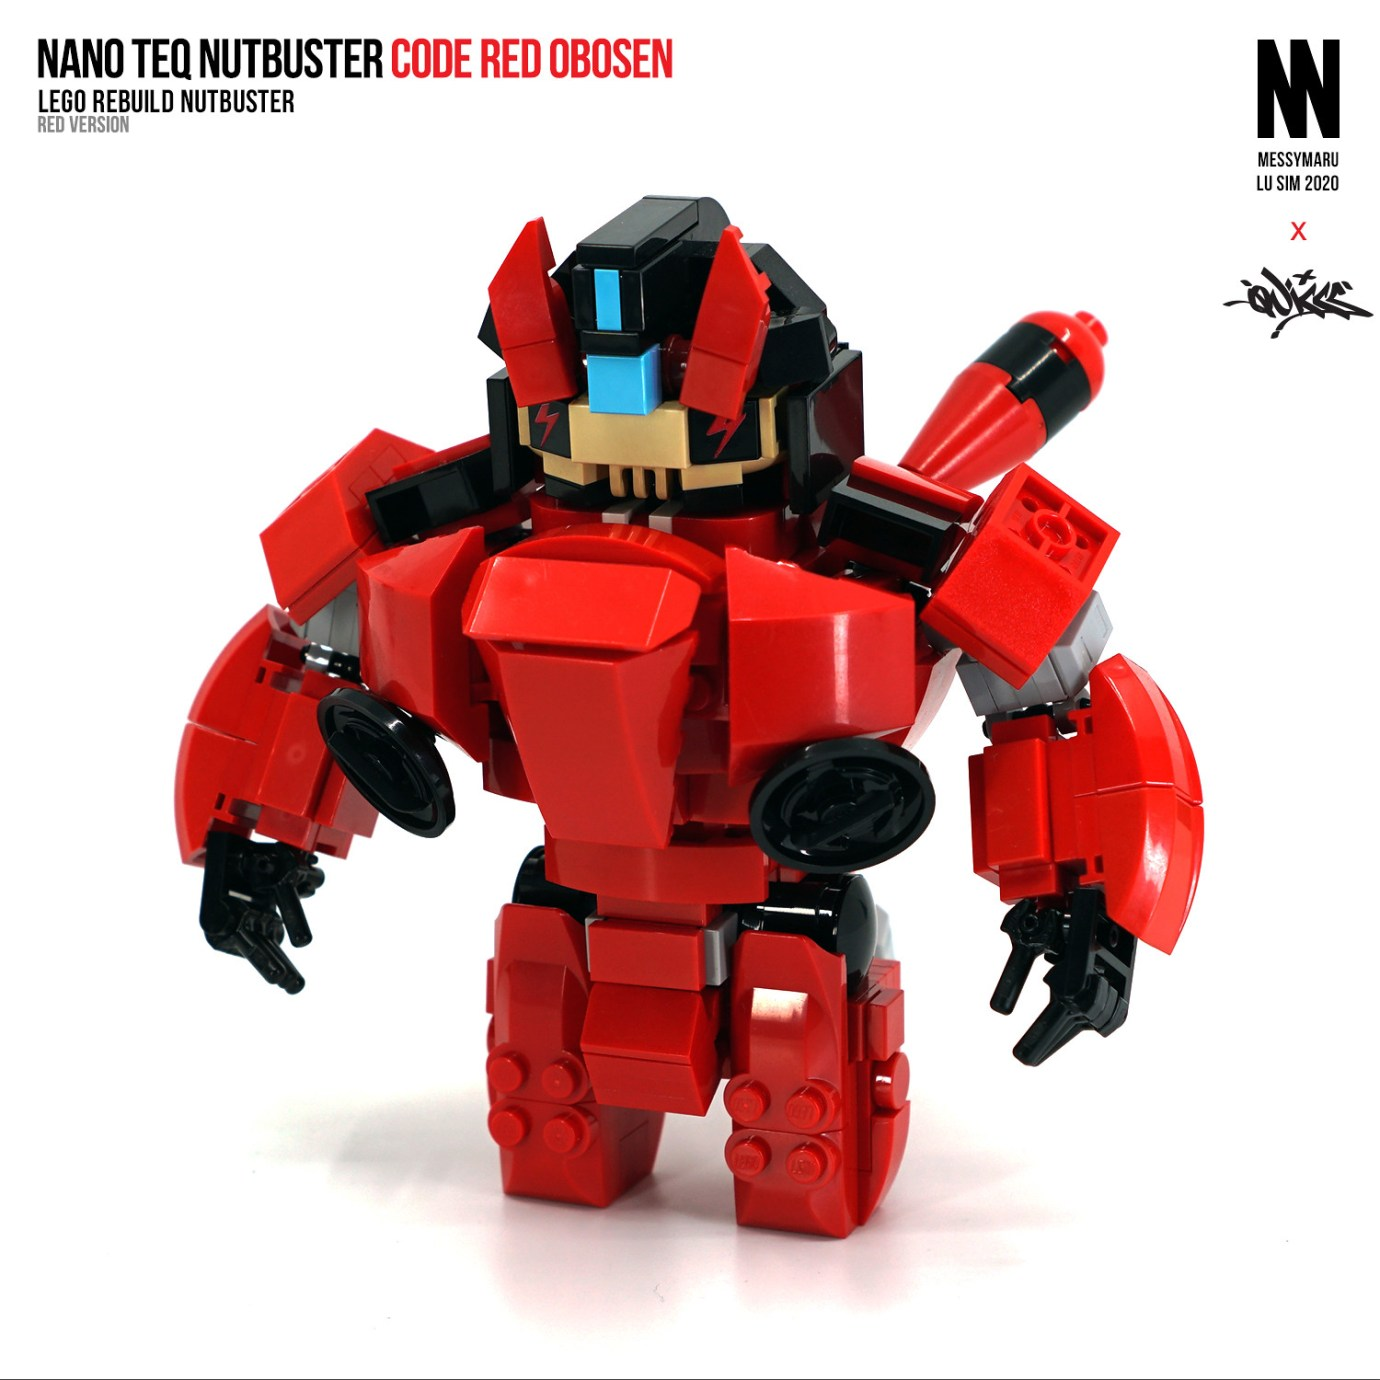 NanoTEQ Nutbuster Code Red OBOSEN